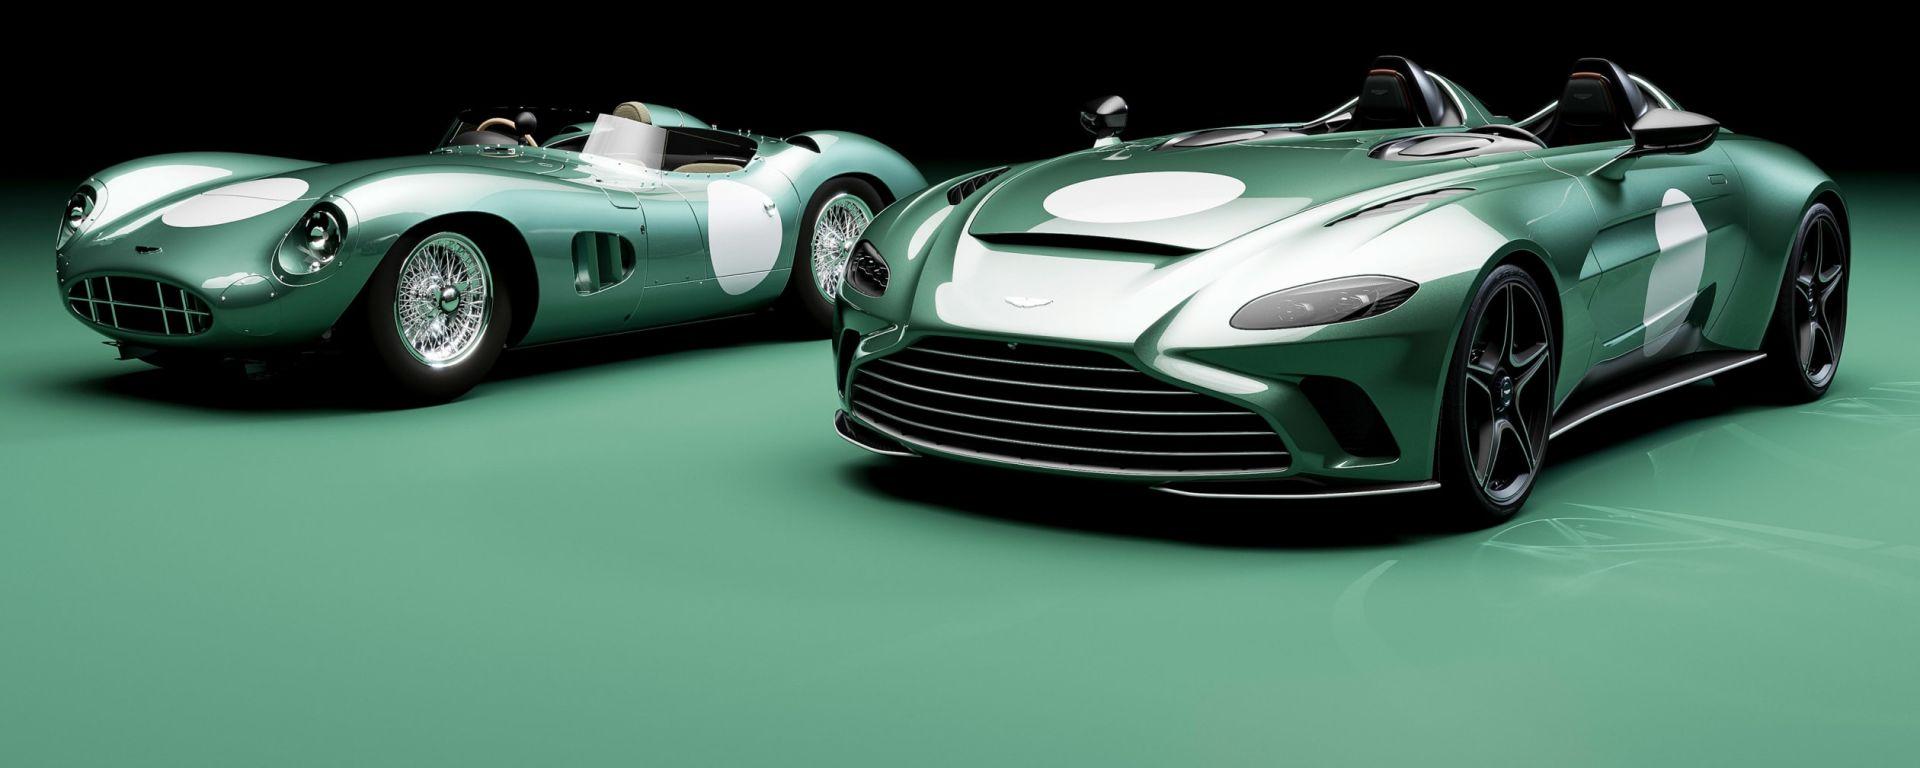 Aston Martin V12 Speedster DBR1: omaggio al passato vincente